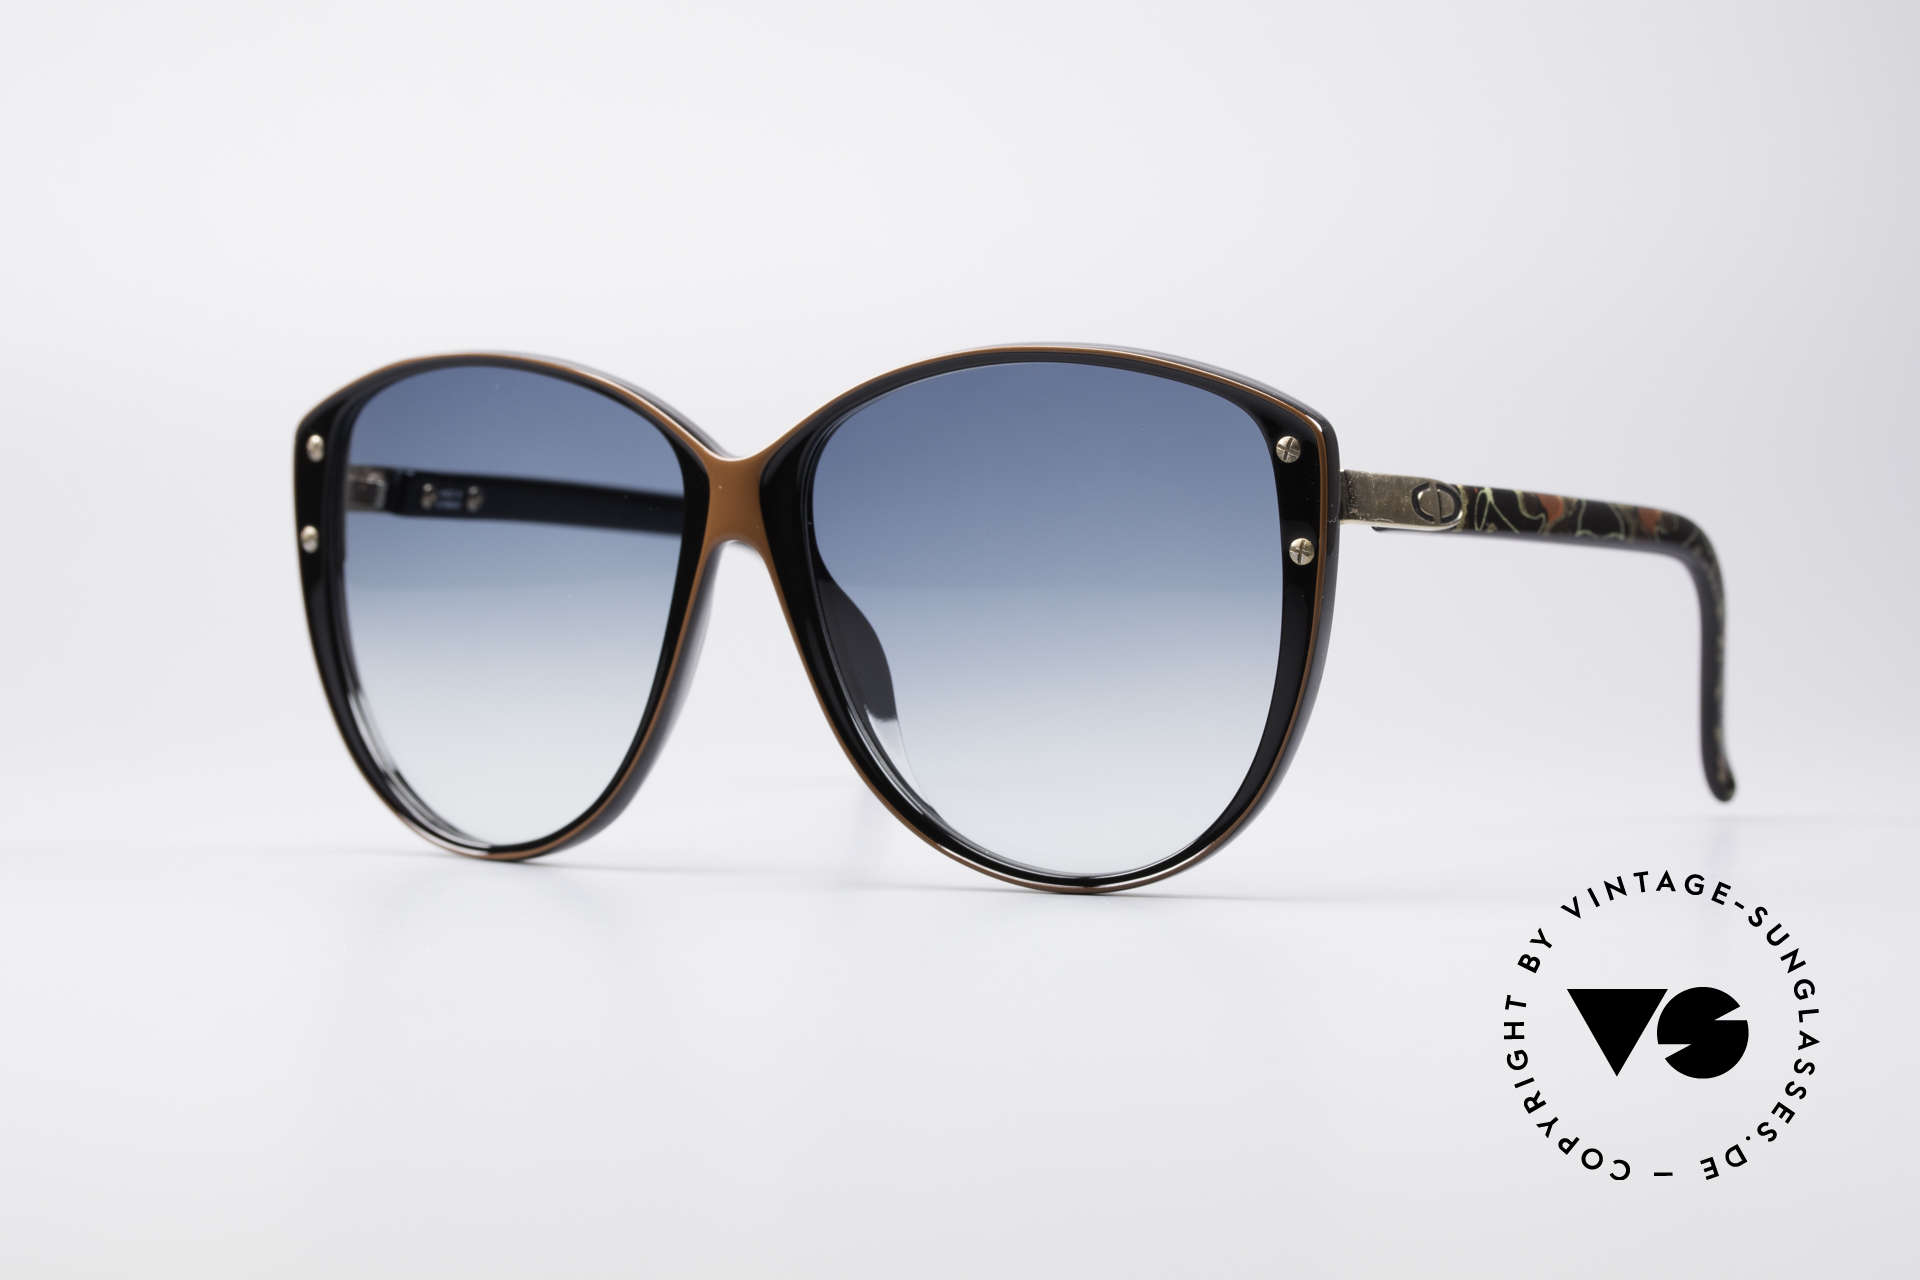 Christian Dior 2277 XL 70's Ladies Sunglasses, fashionable XXL 70's sunglasses by Christian DIOR, Made for Women